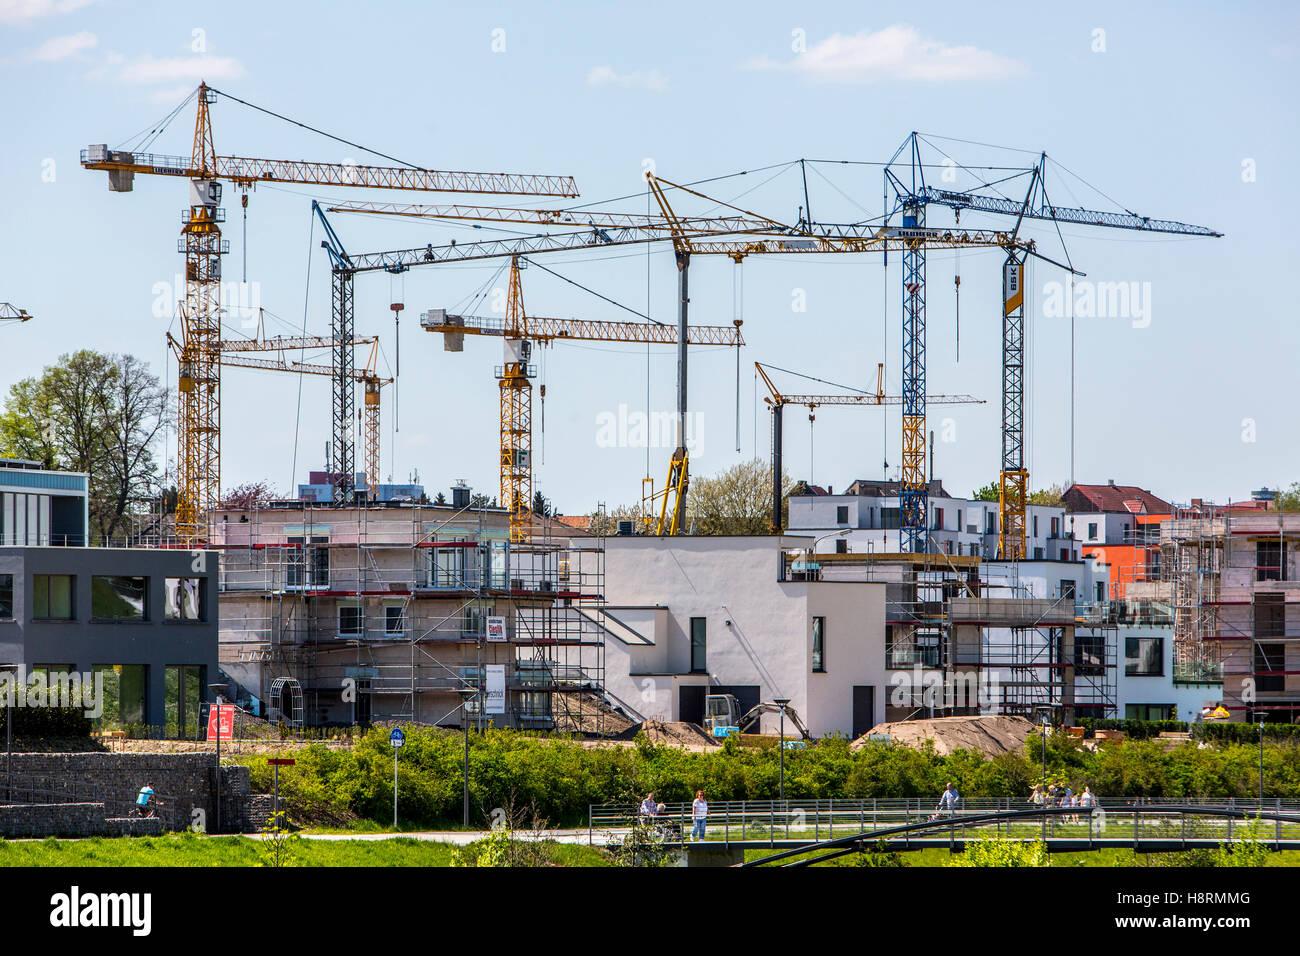 Baustelle, Wohn-Häuser, Baukräne, Deutschland Stockbild